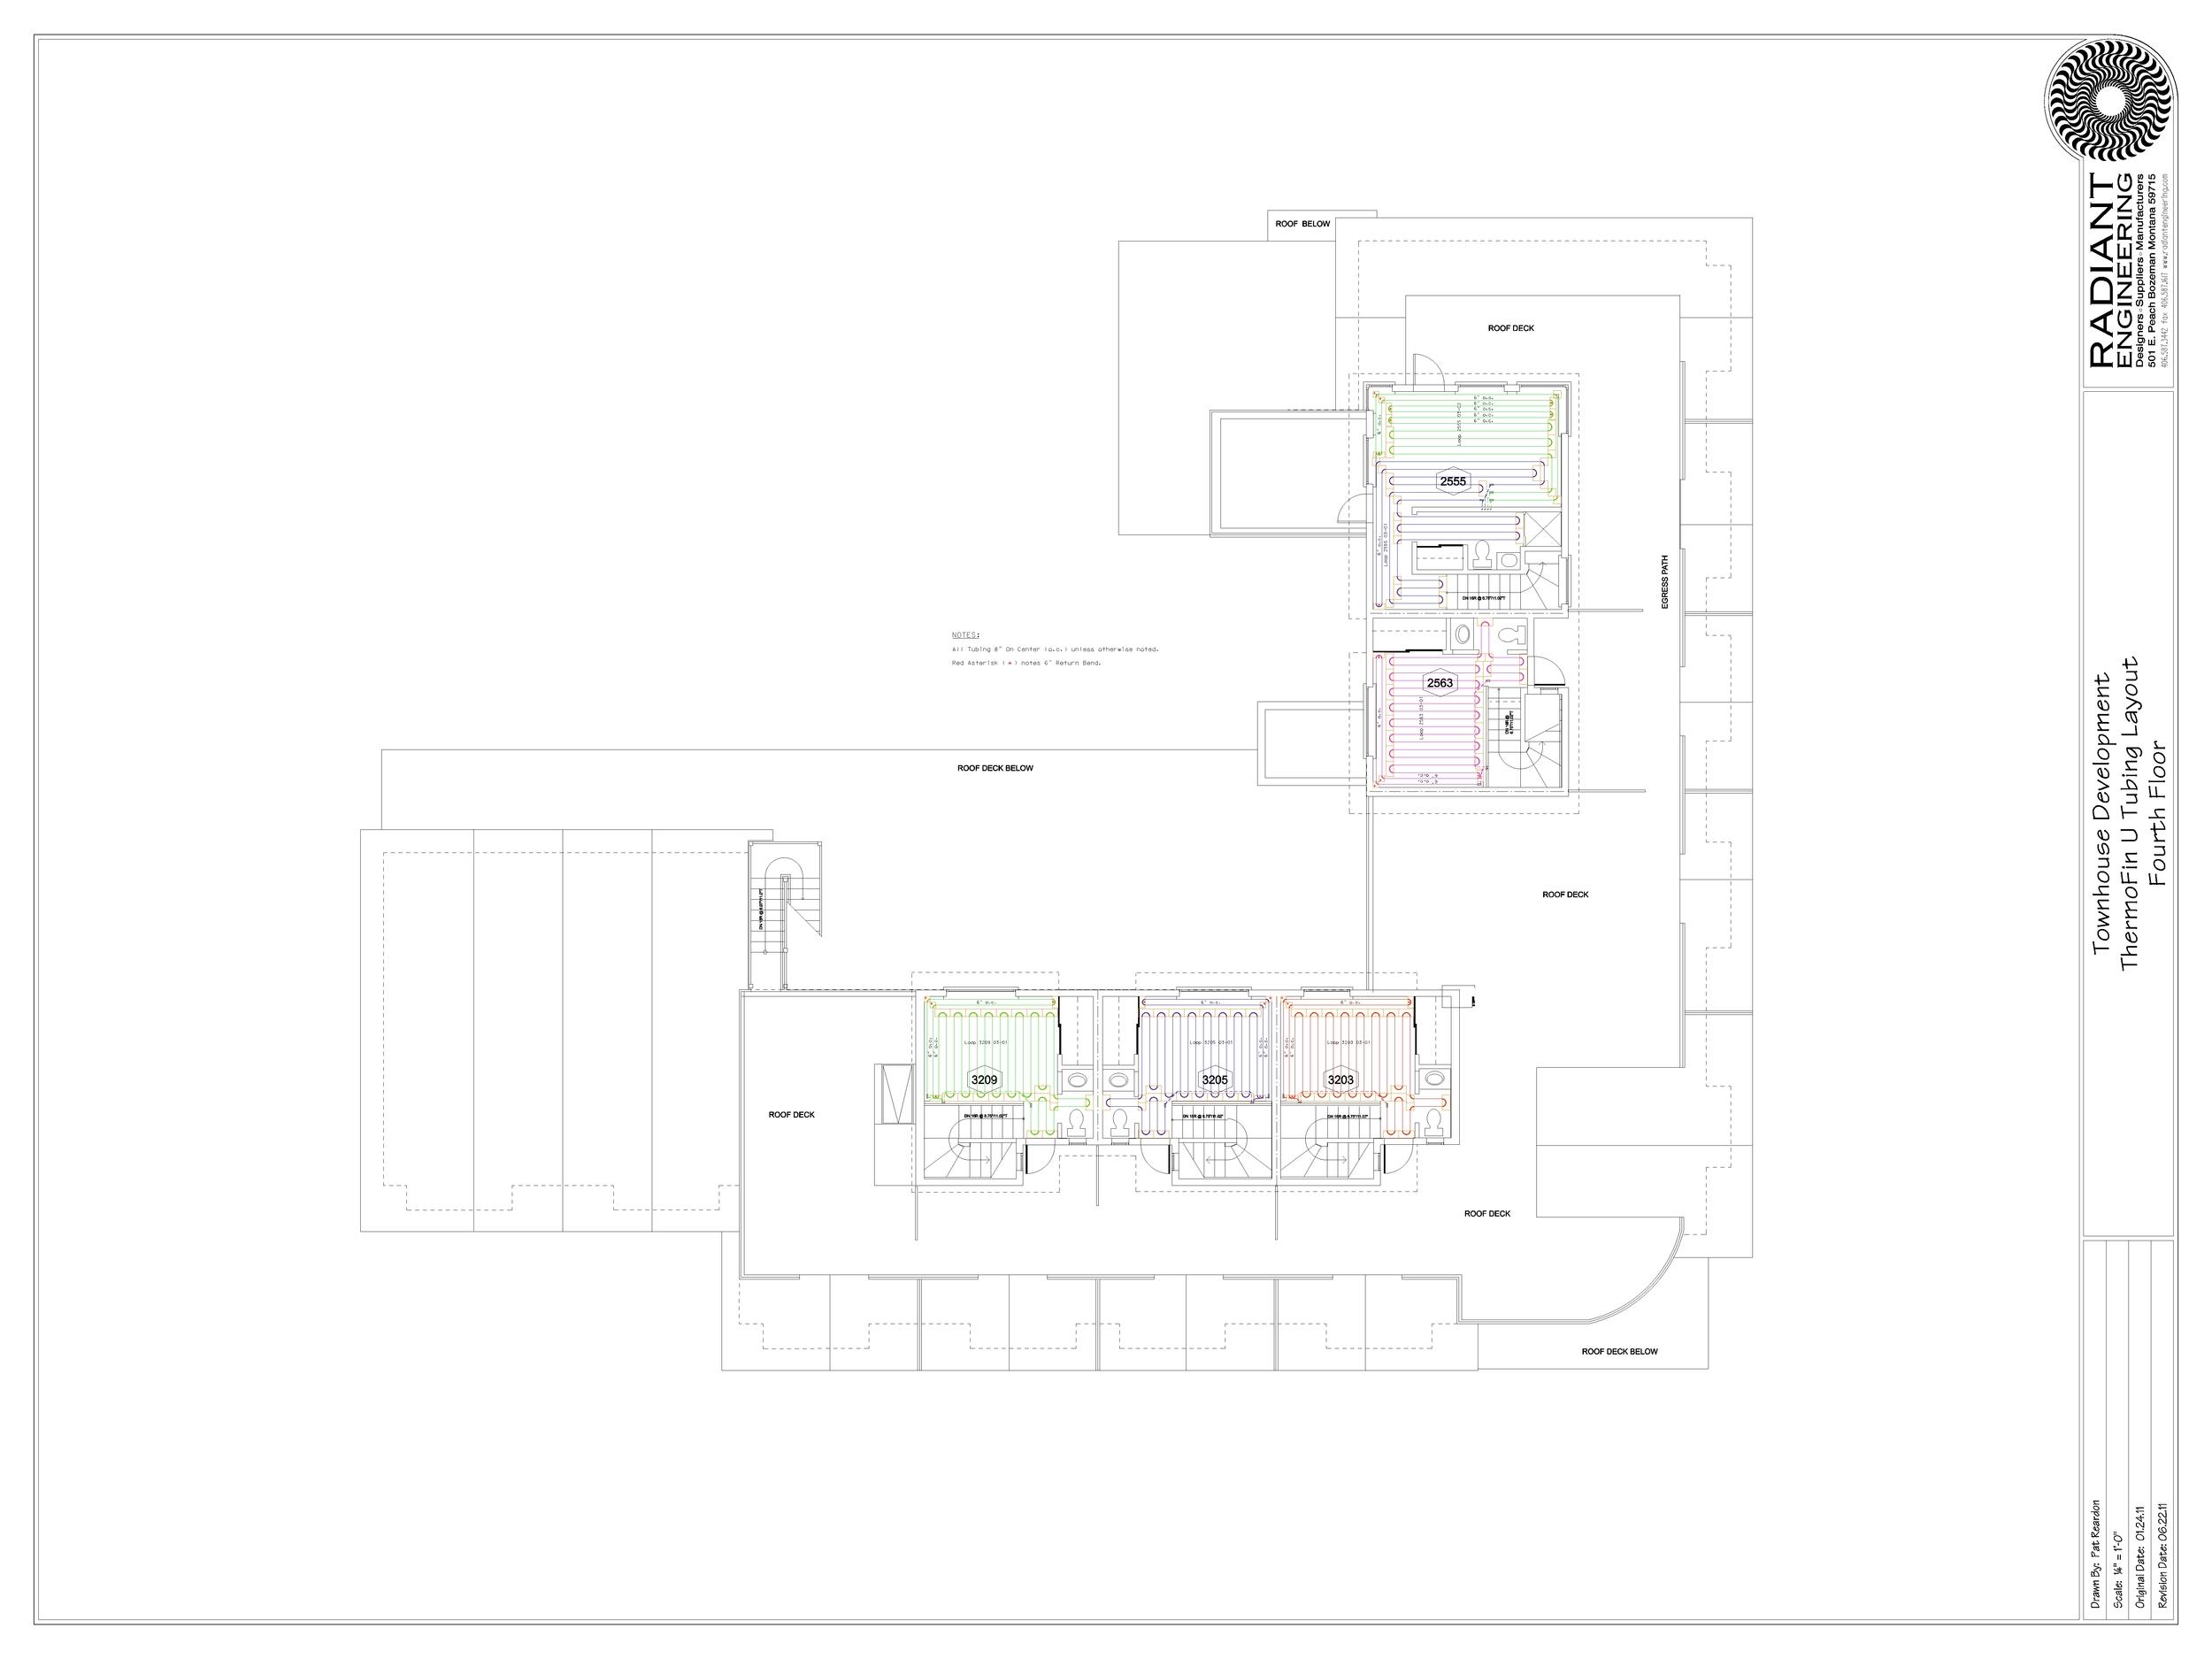 Townhouse Development Level 4